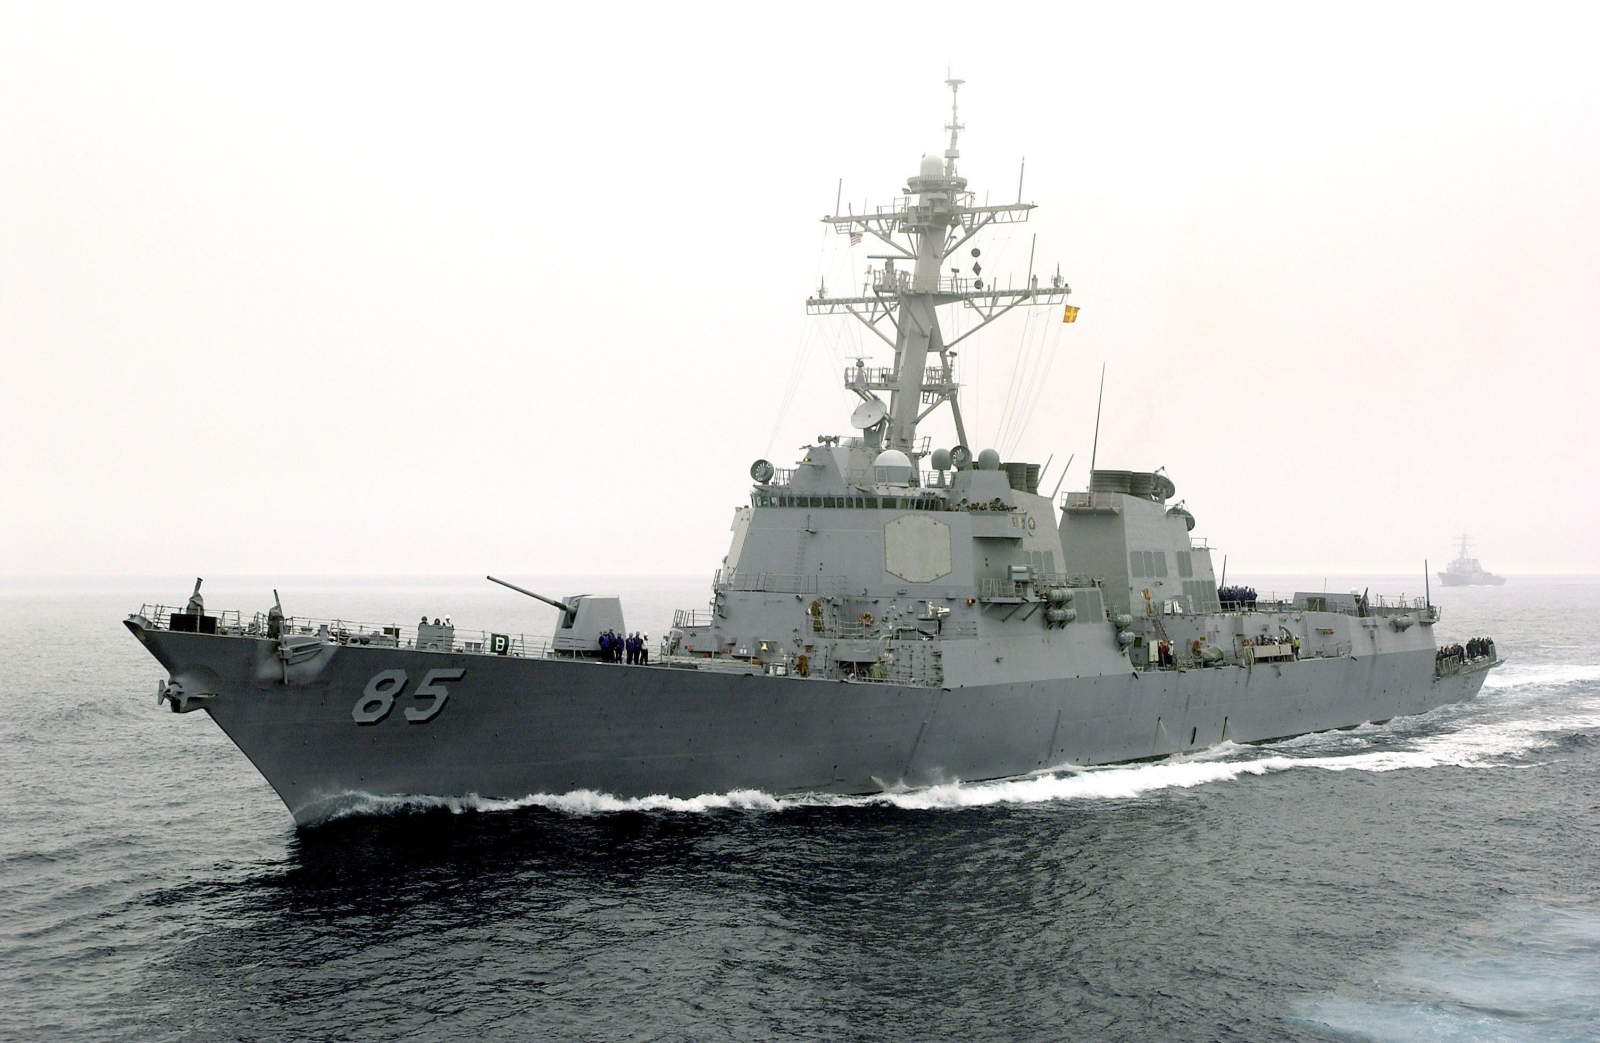 US Navy frigate